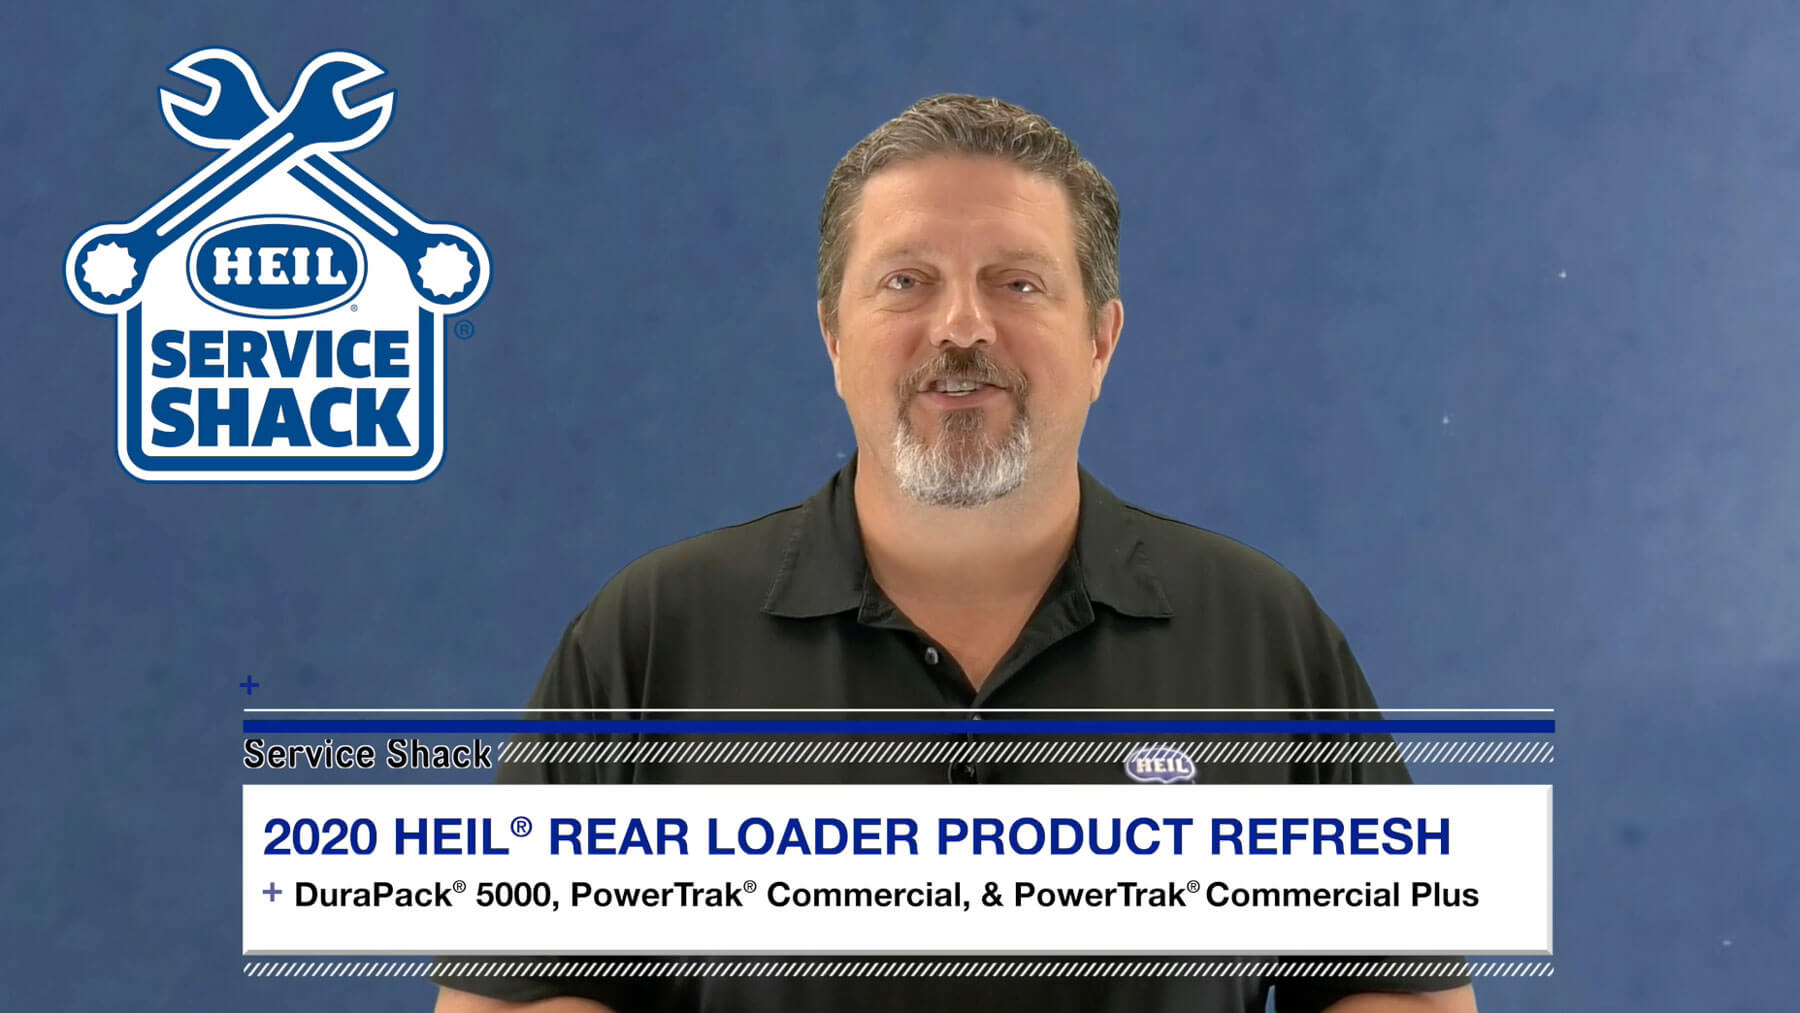 Rearloader Controller Refresh